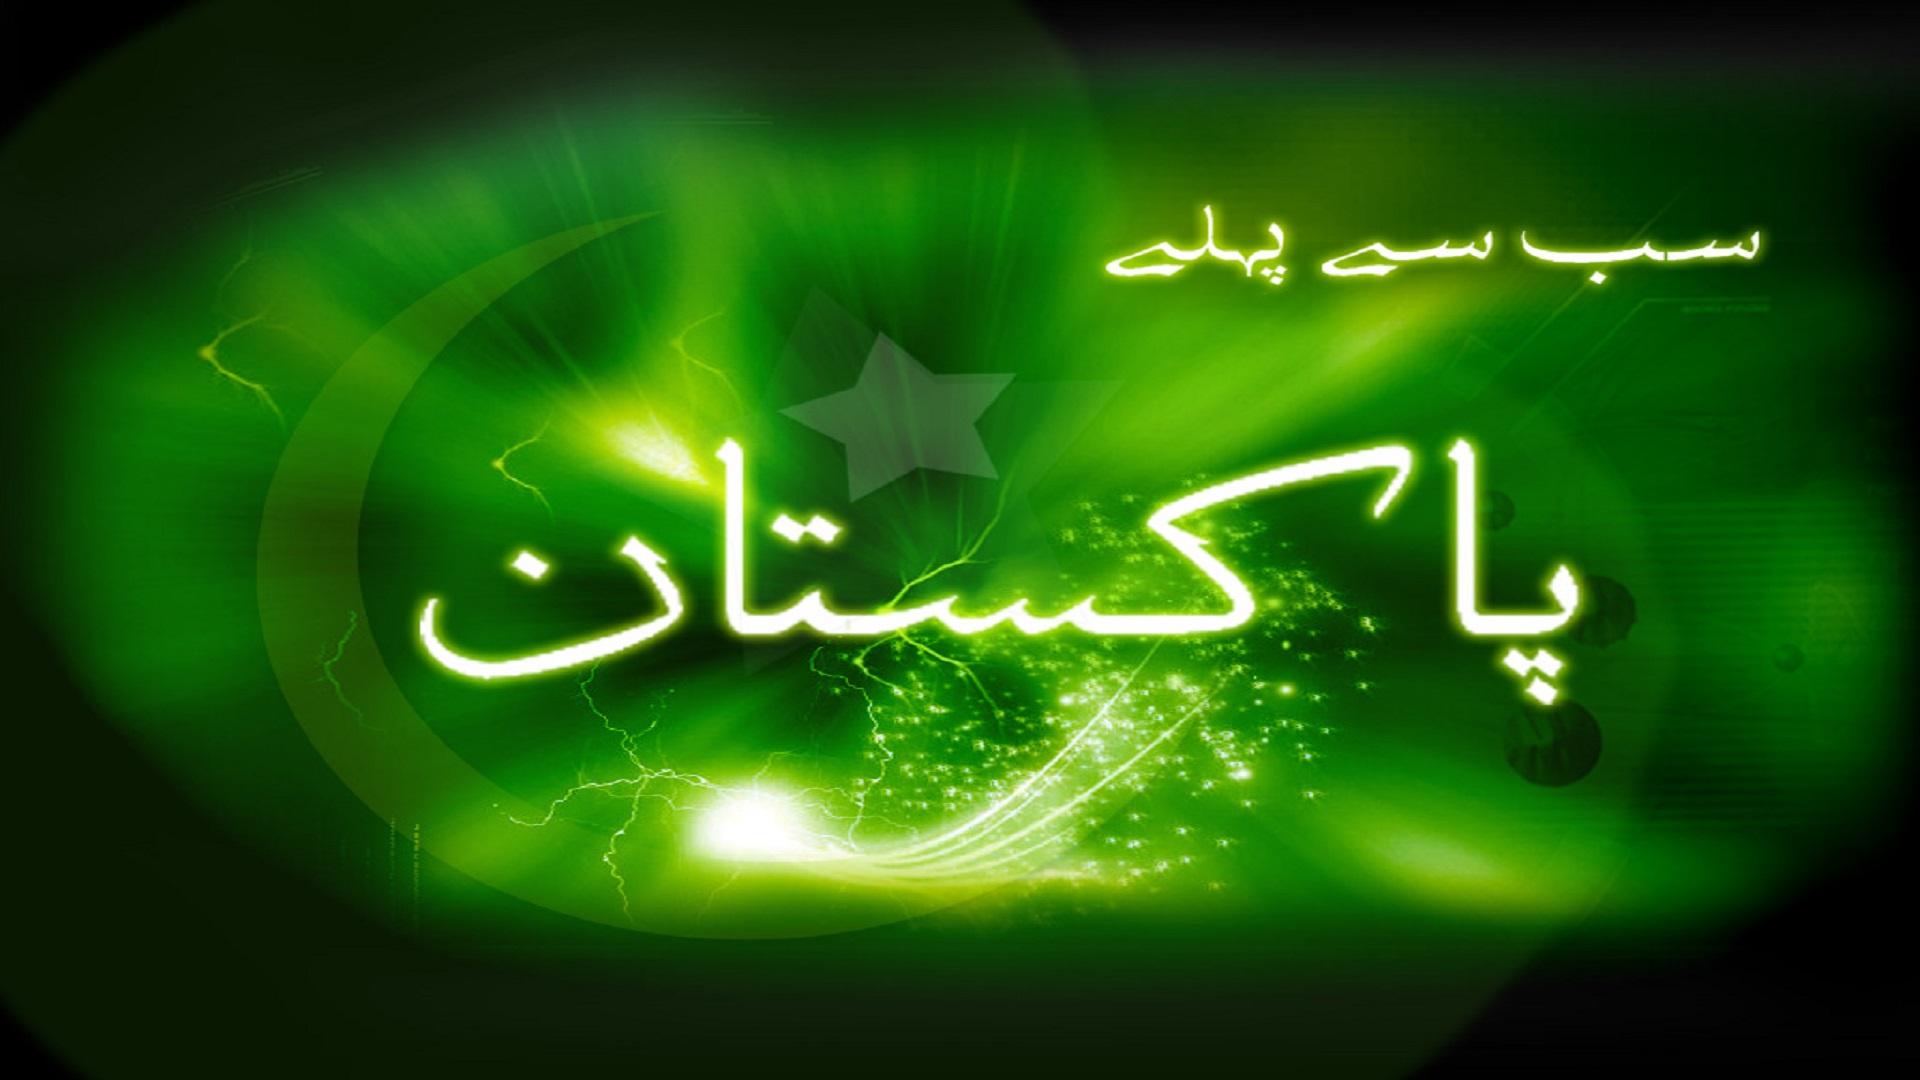 sab-sy-phle-pakistani-wallpapers-free-hd